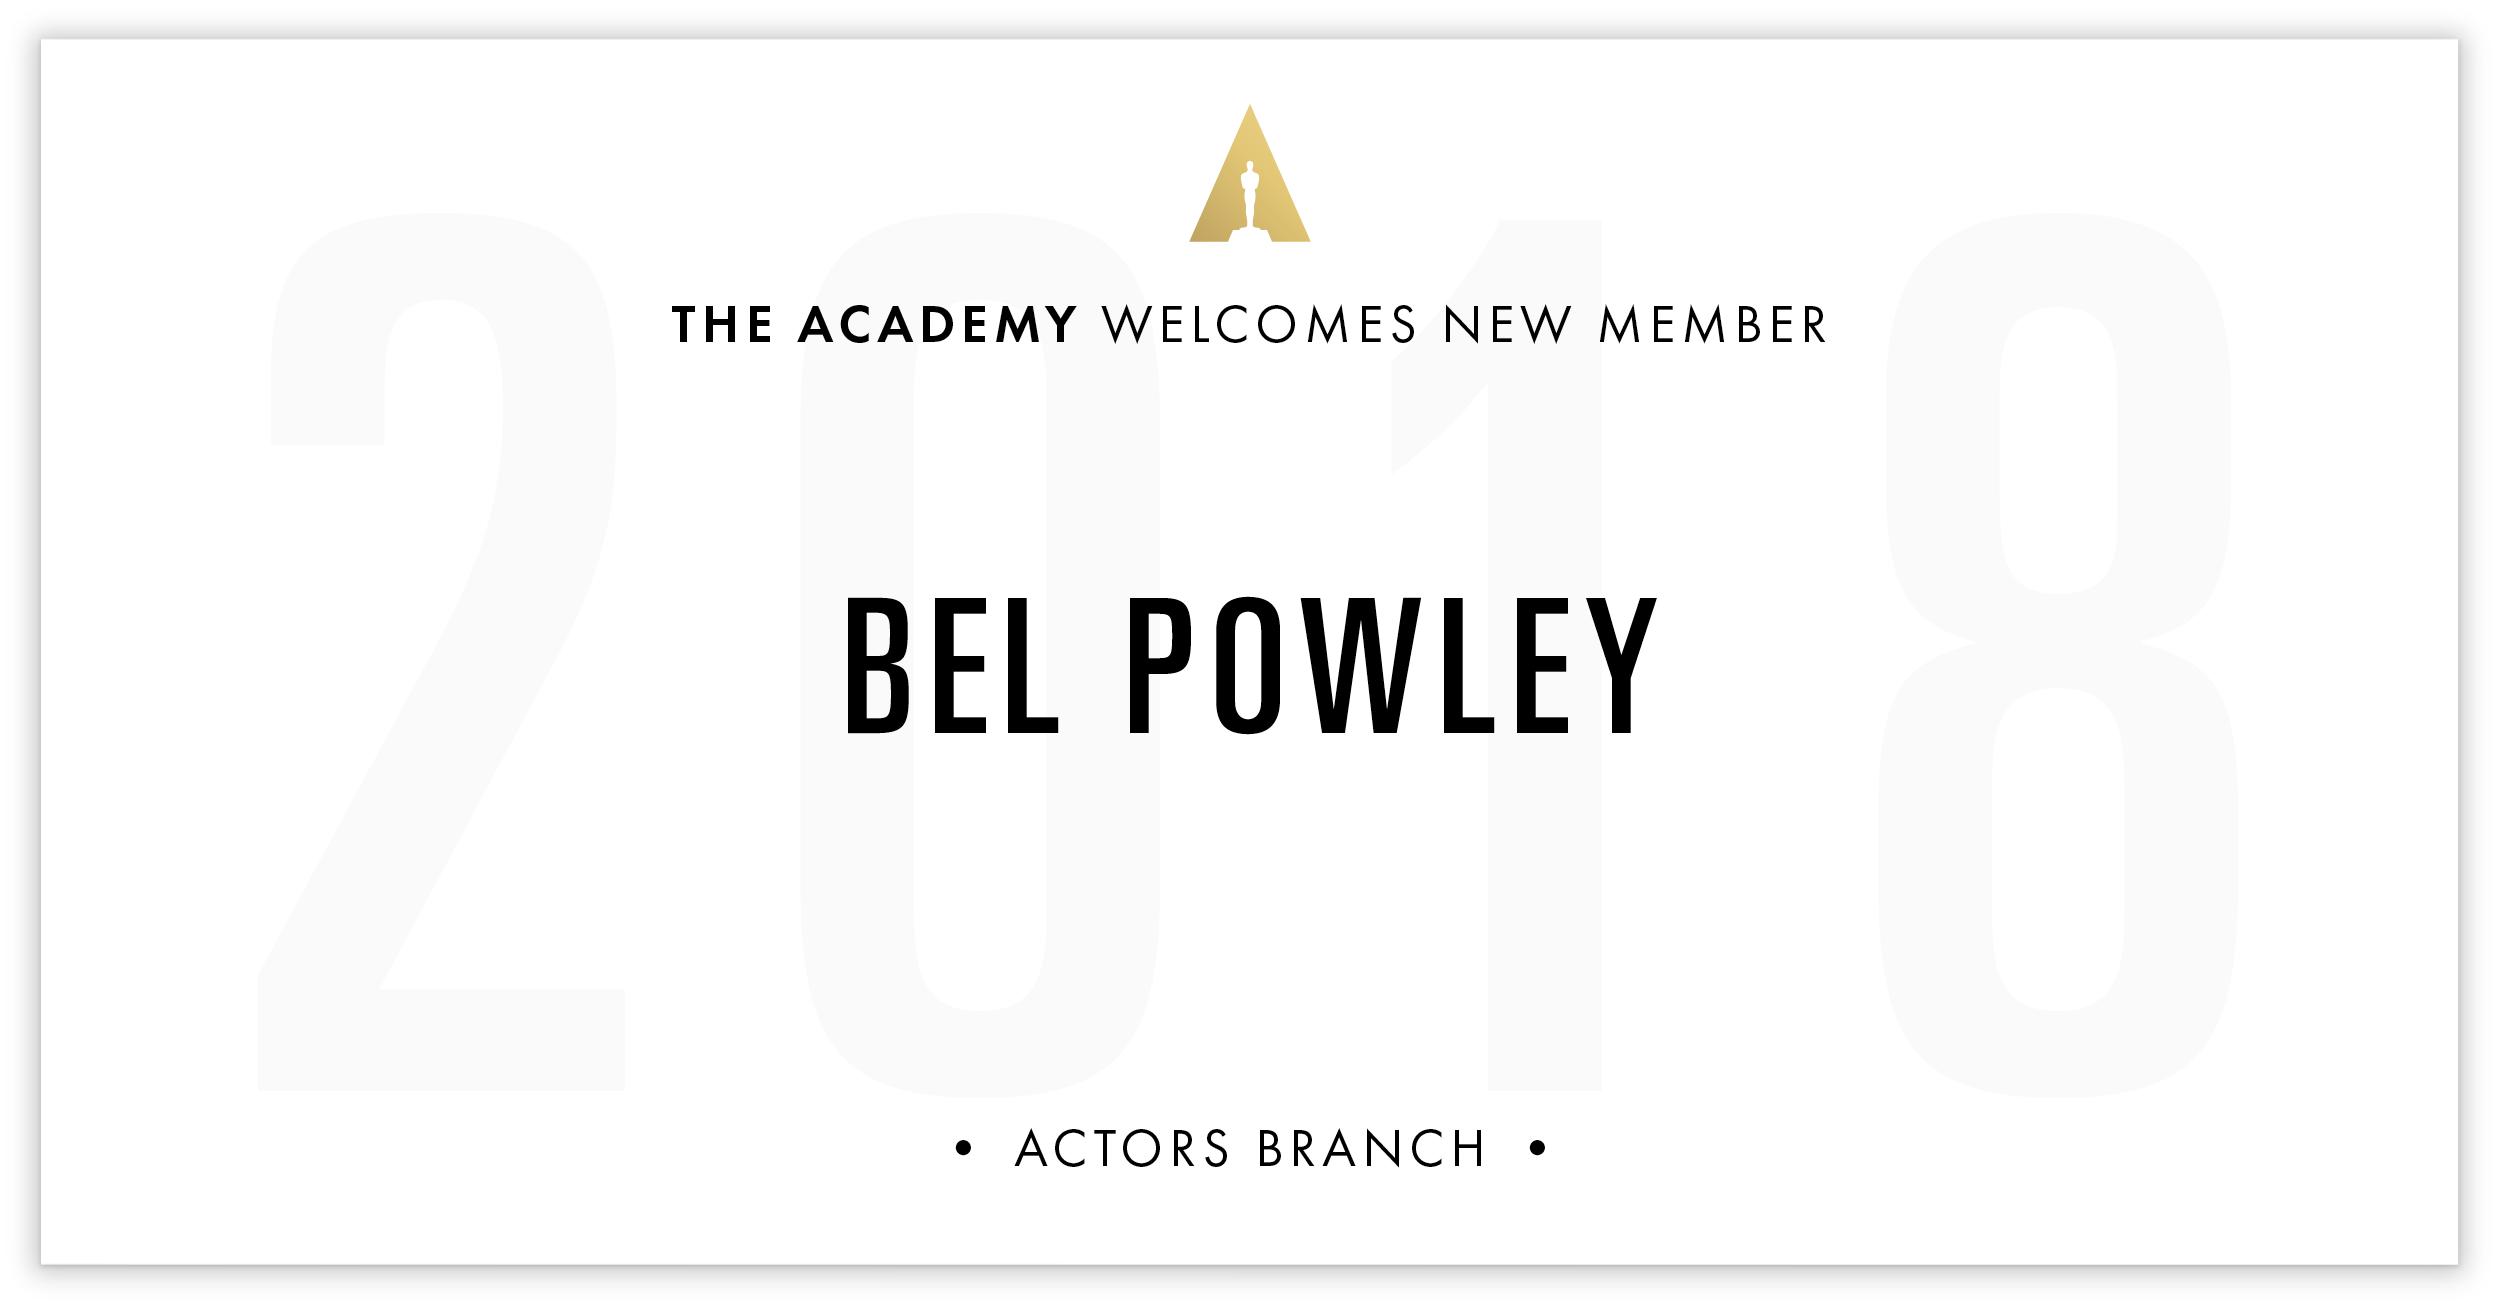 Bel Powley is invited!